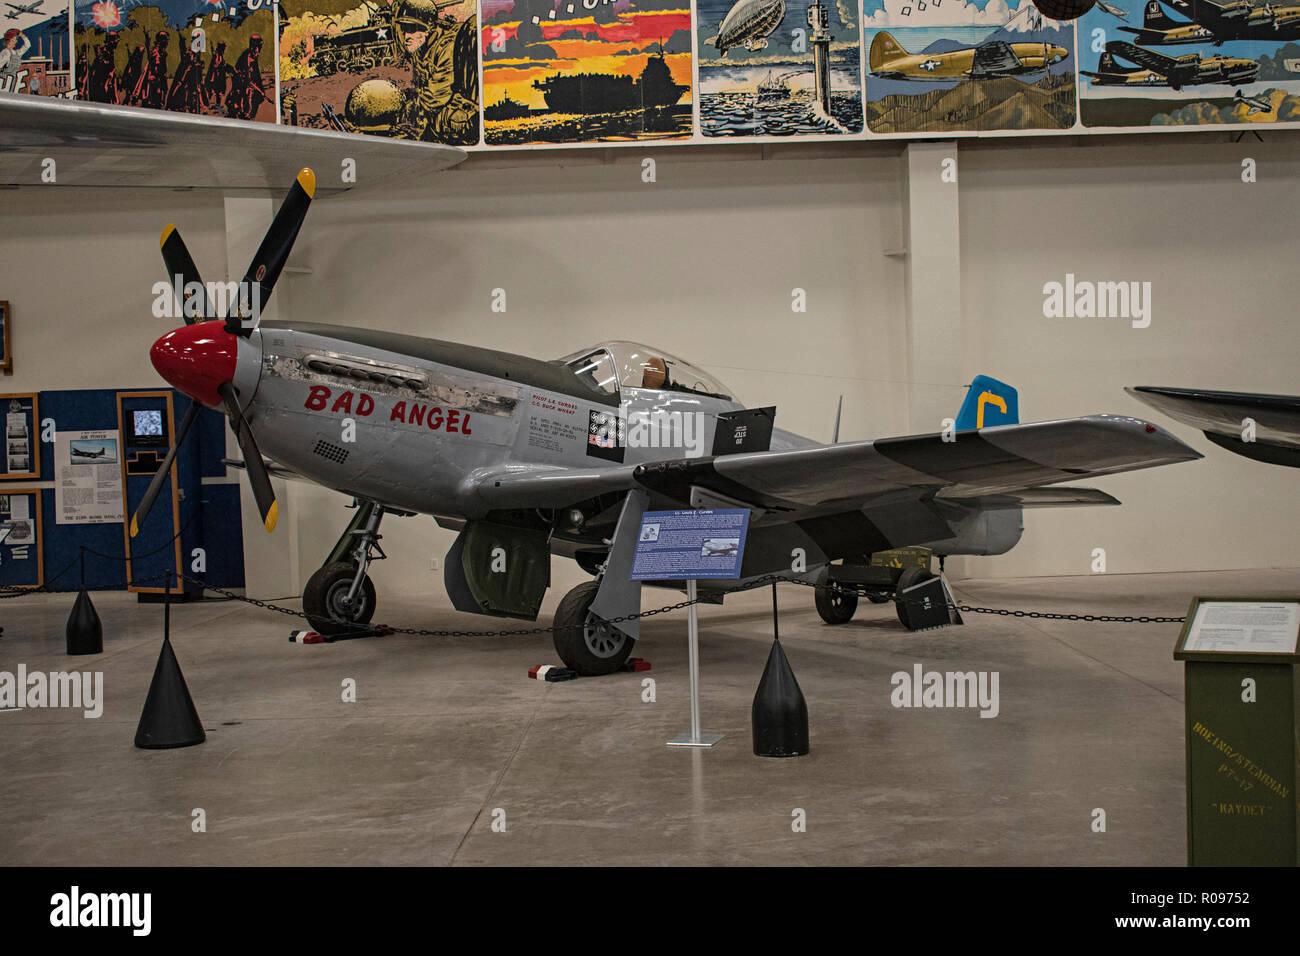 P-51 Mustang, Pima Air & Space Museum. Tucson, Arizona. Ee.Uu. Foto de stock